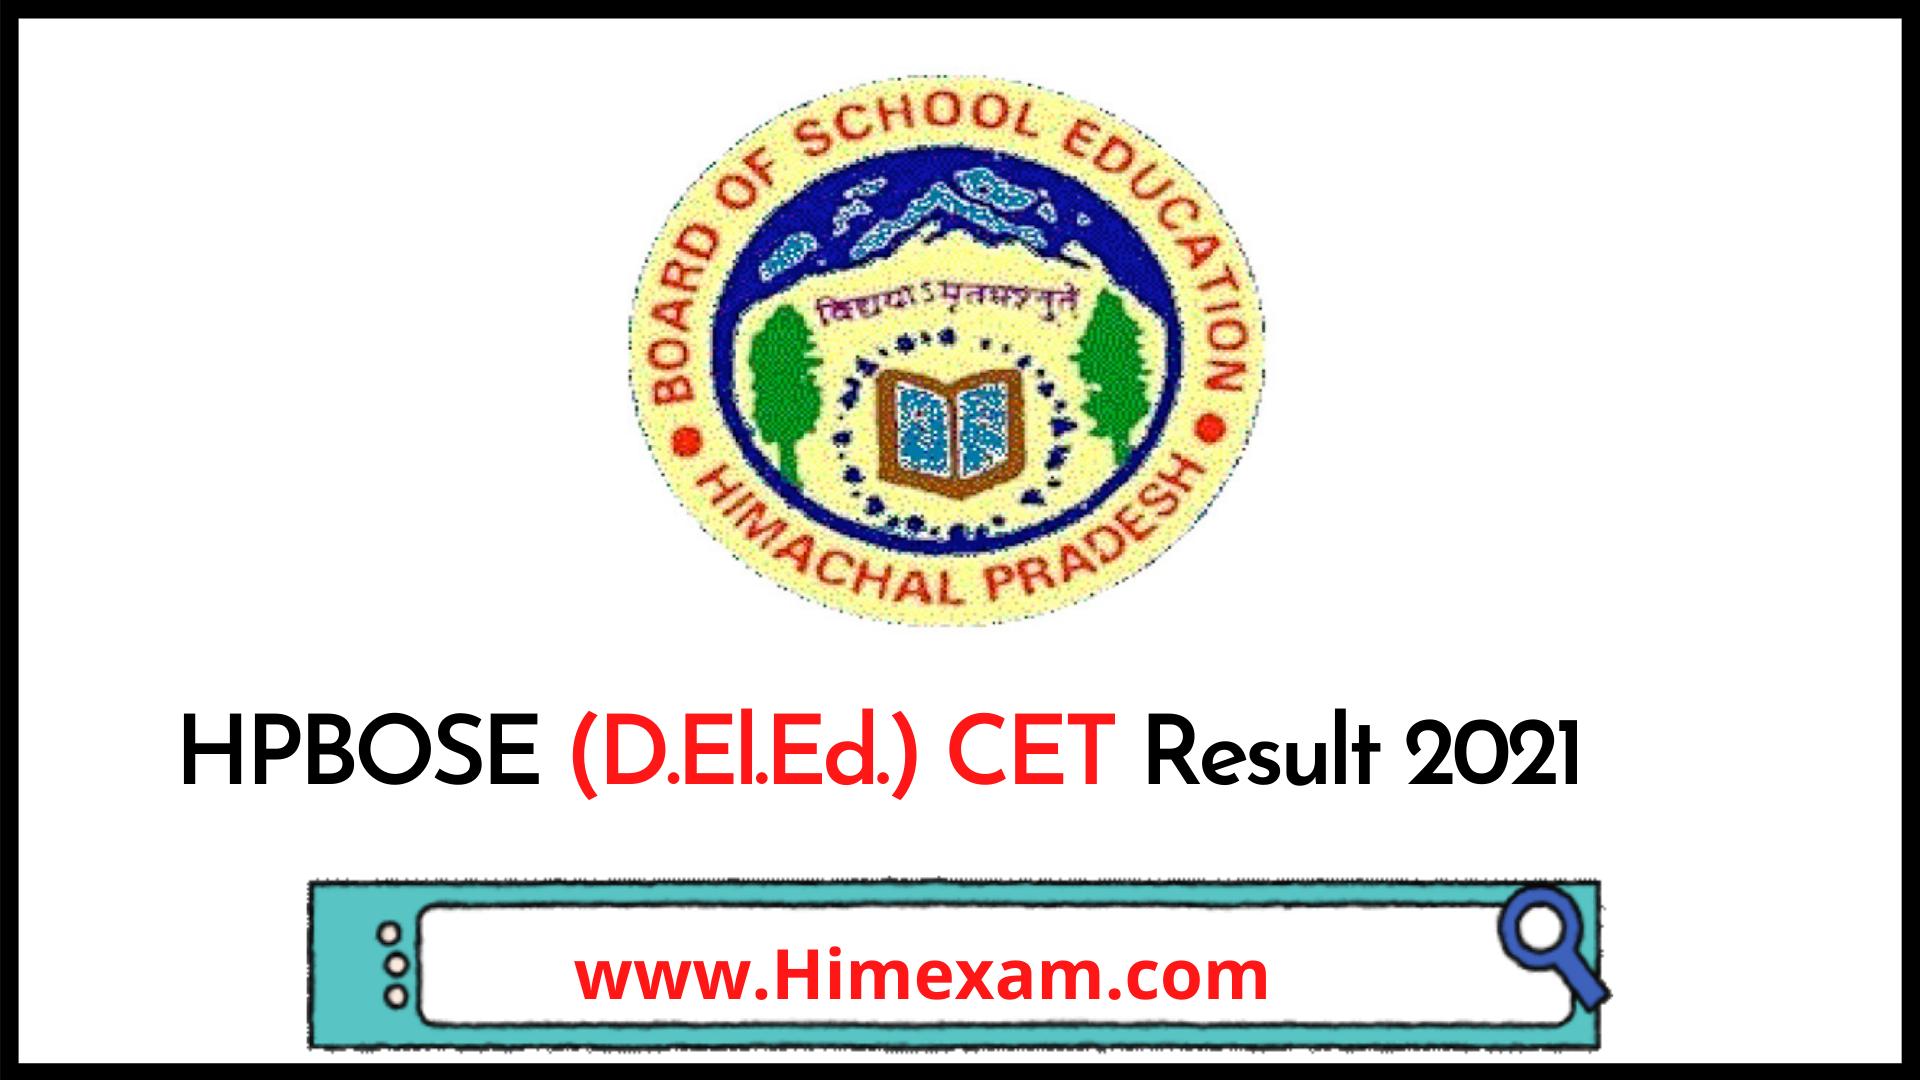 HPBOSE (D.El.Ed.) CET Result 2021